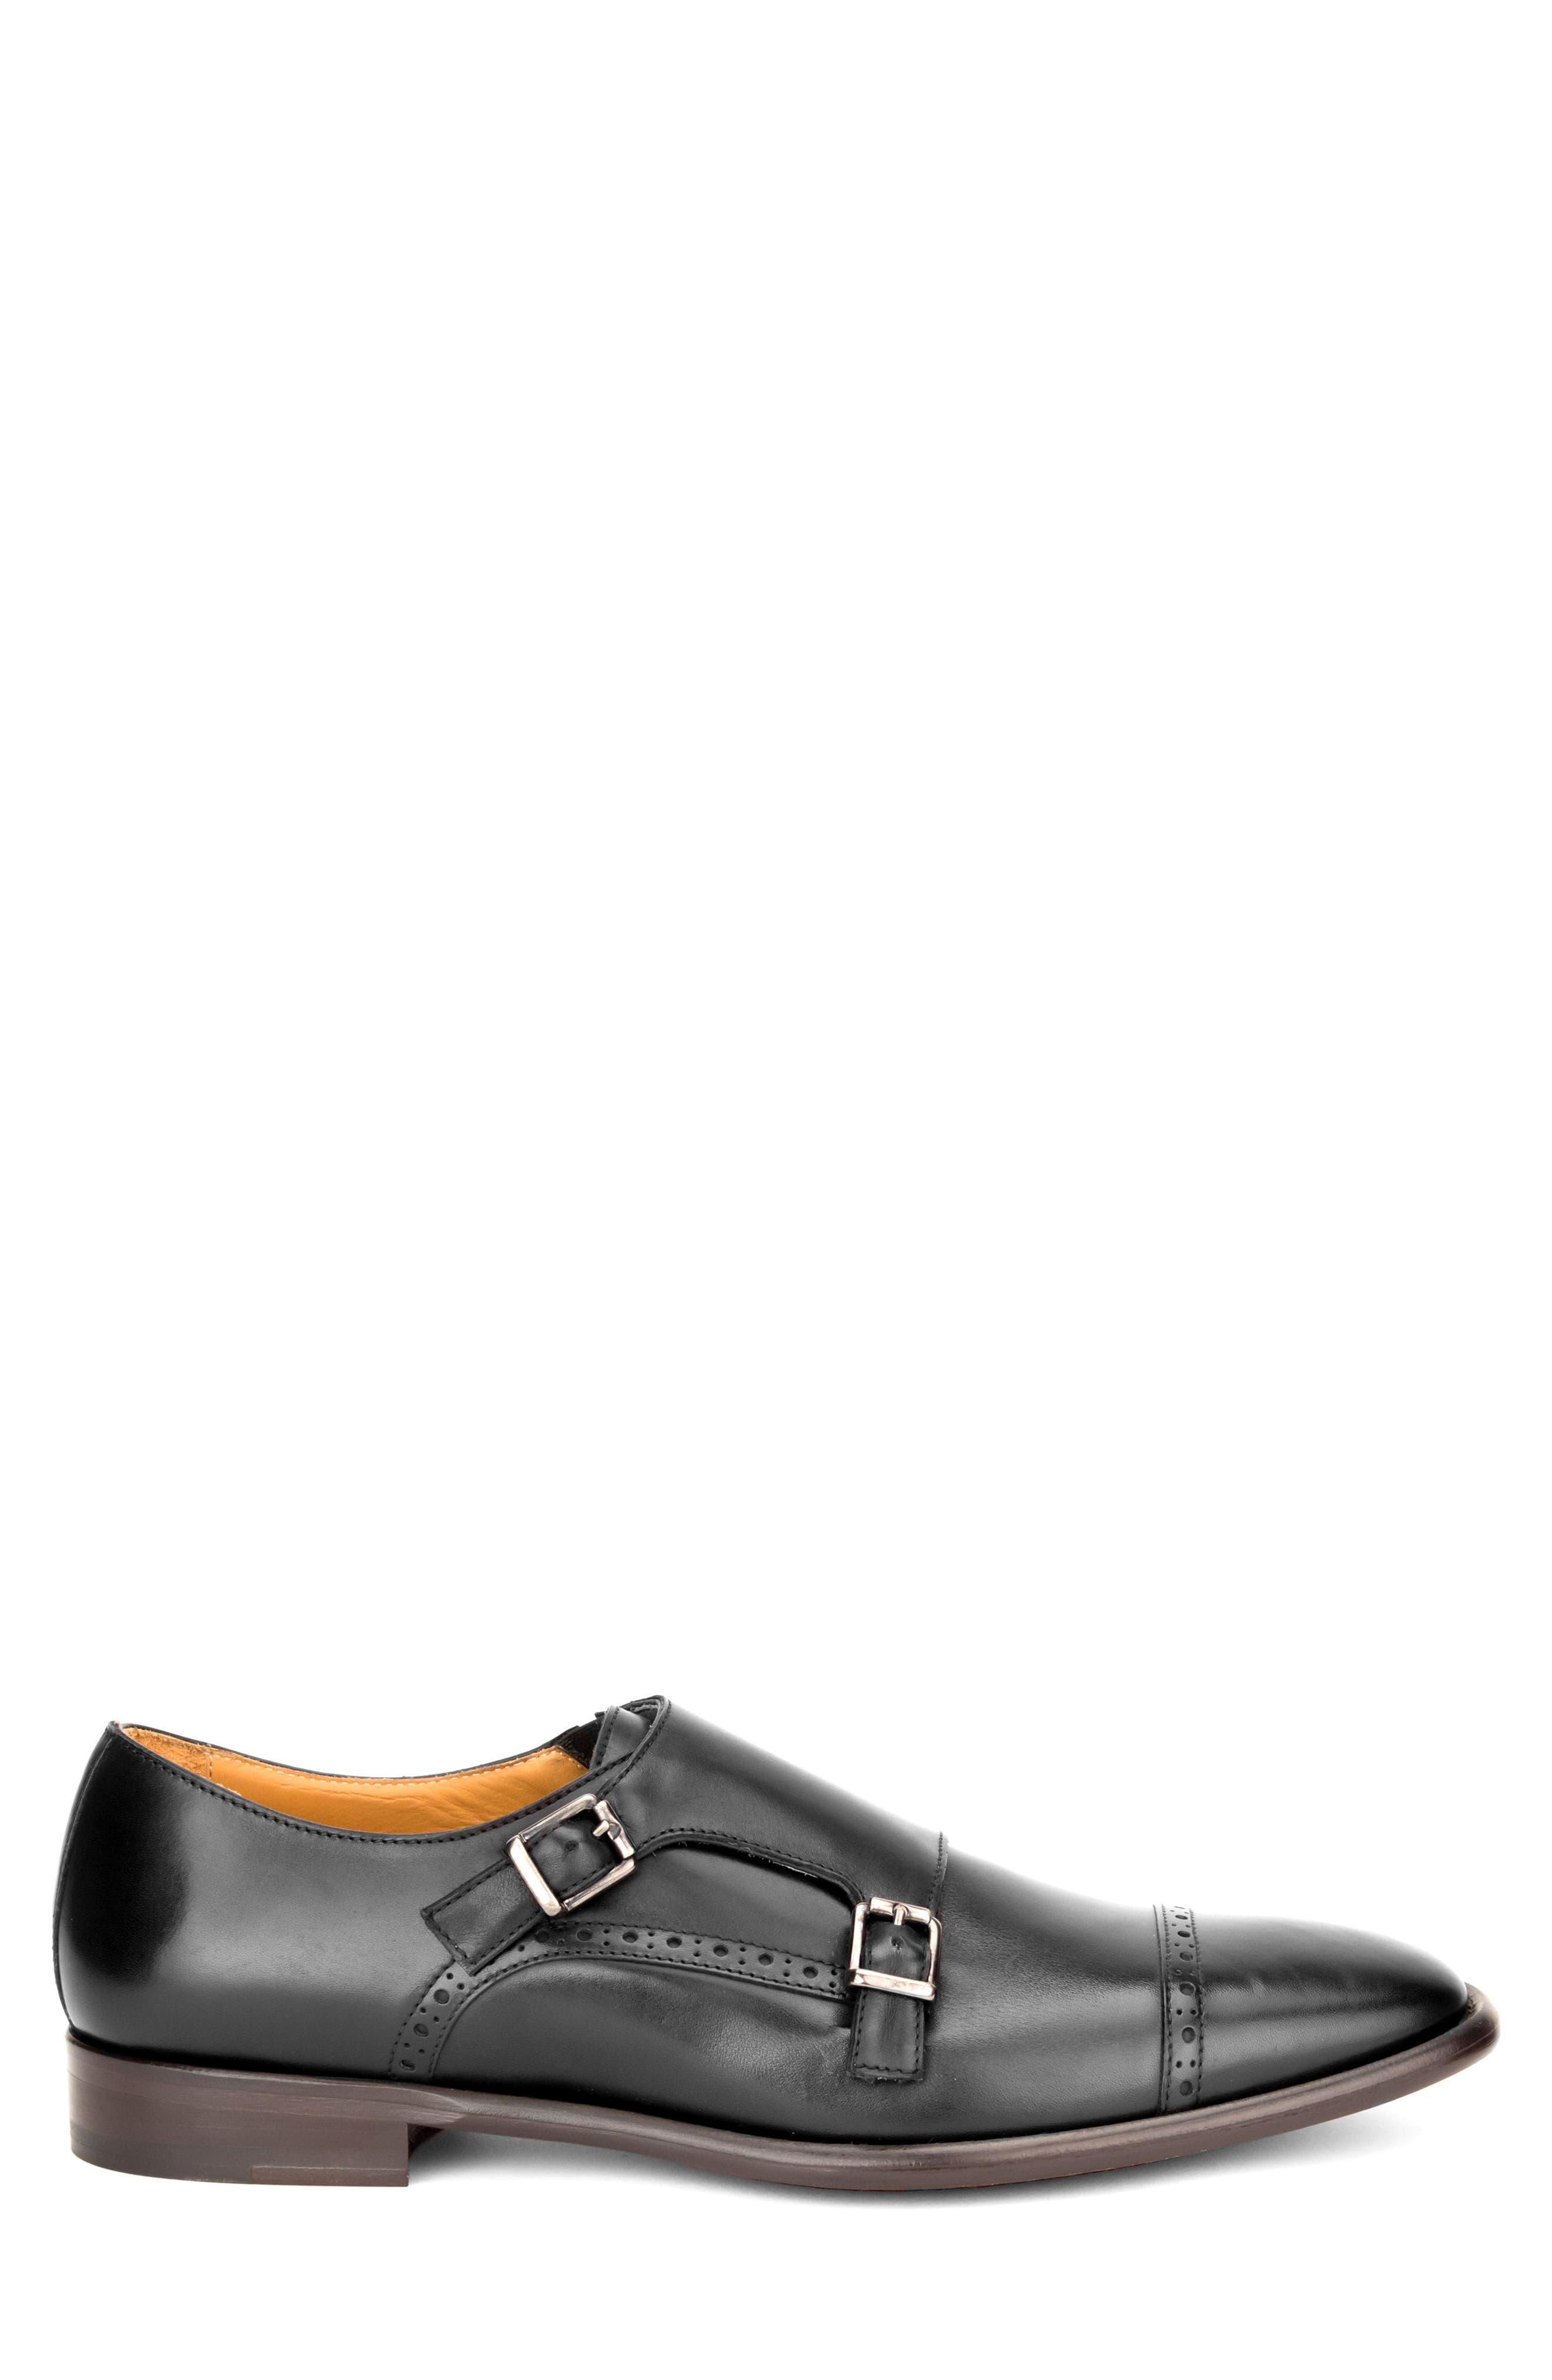 Corbett Cap Toe Double Strap Monk Shoe,                             Alternate thumbnail 3, color,                             Black Leather